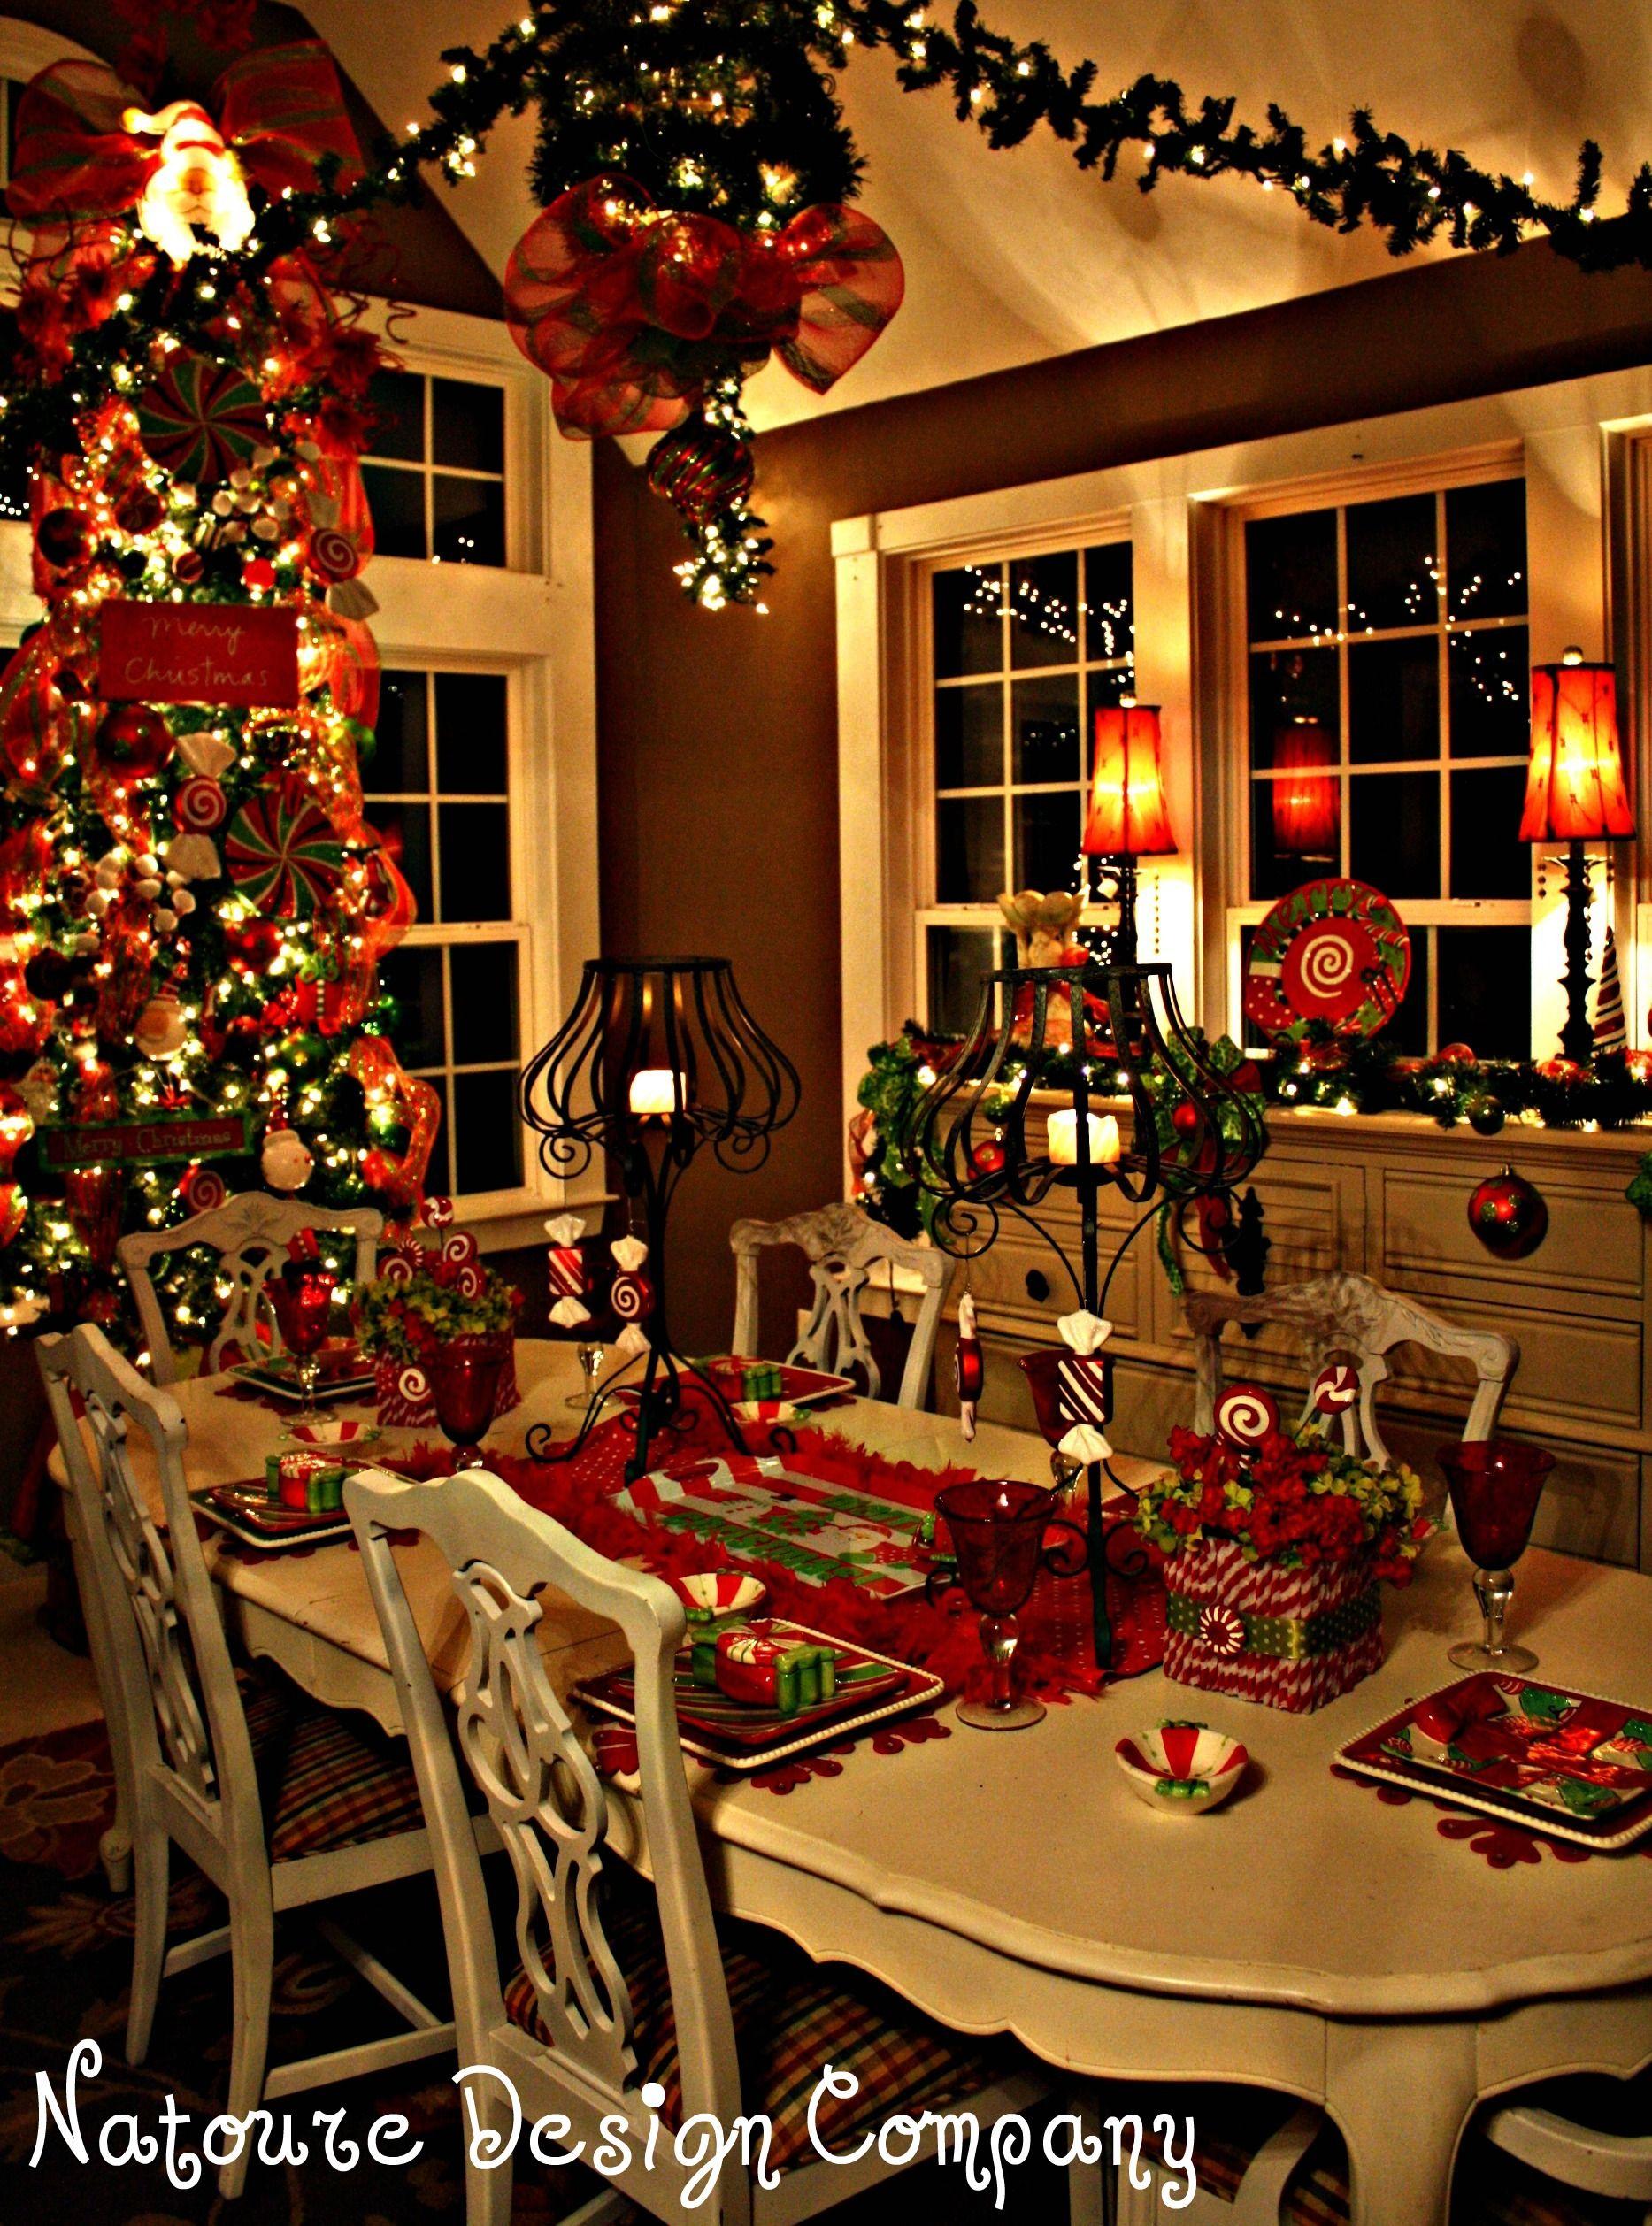 Christmas dining room unbelievably stunning - Christmas room decor ideas ...